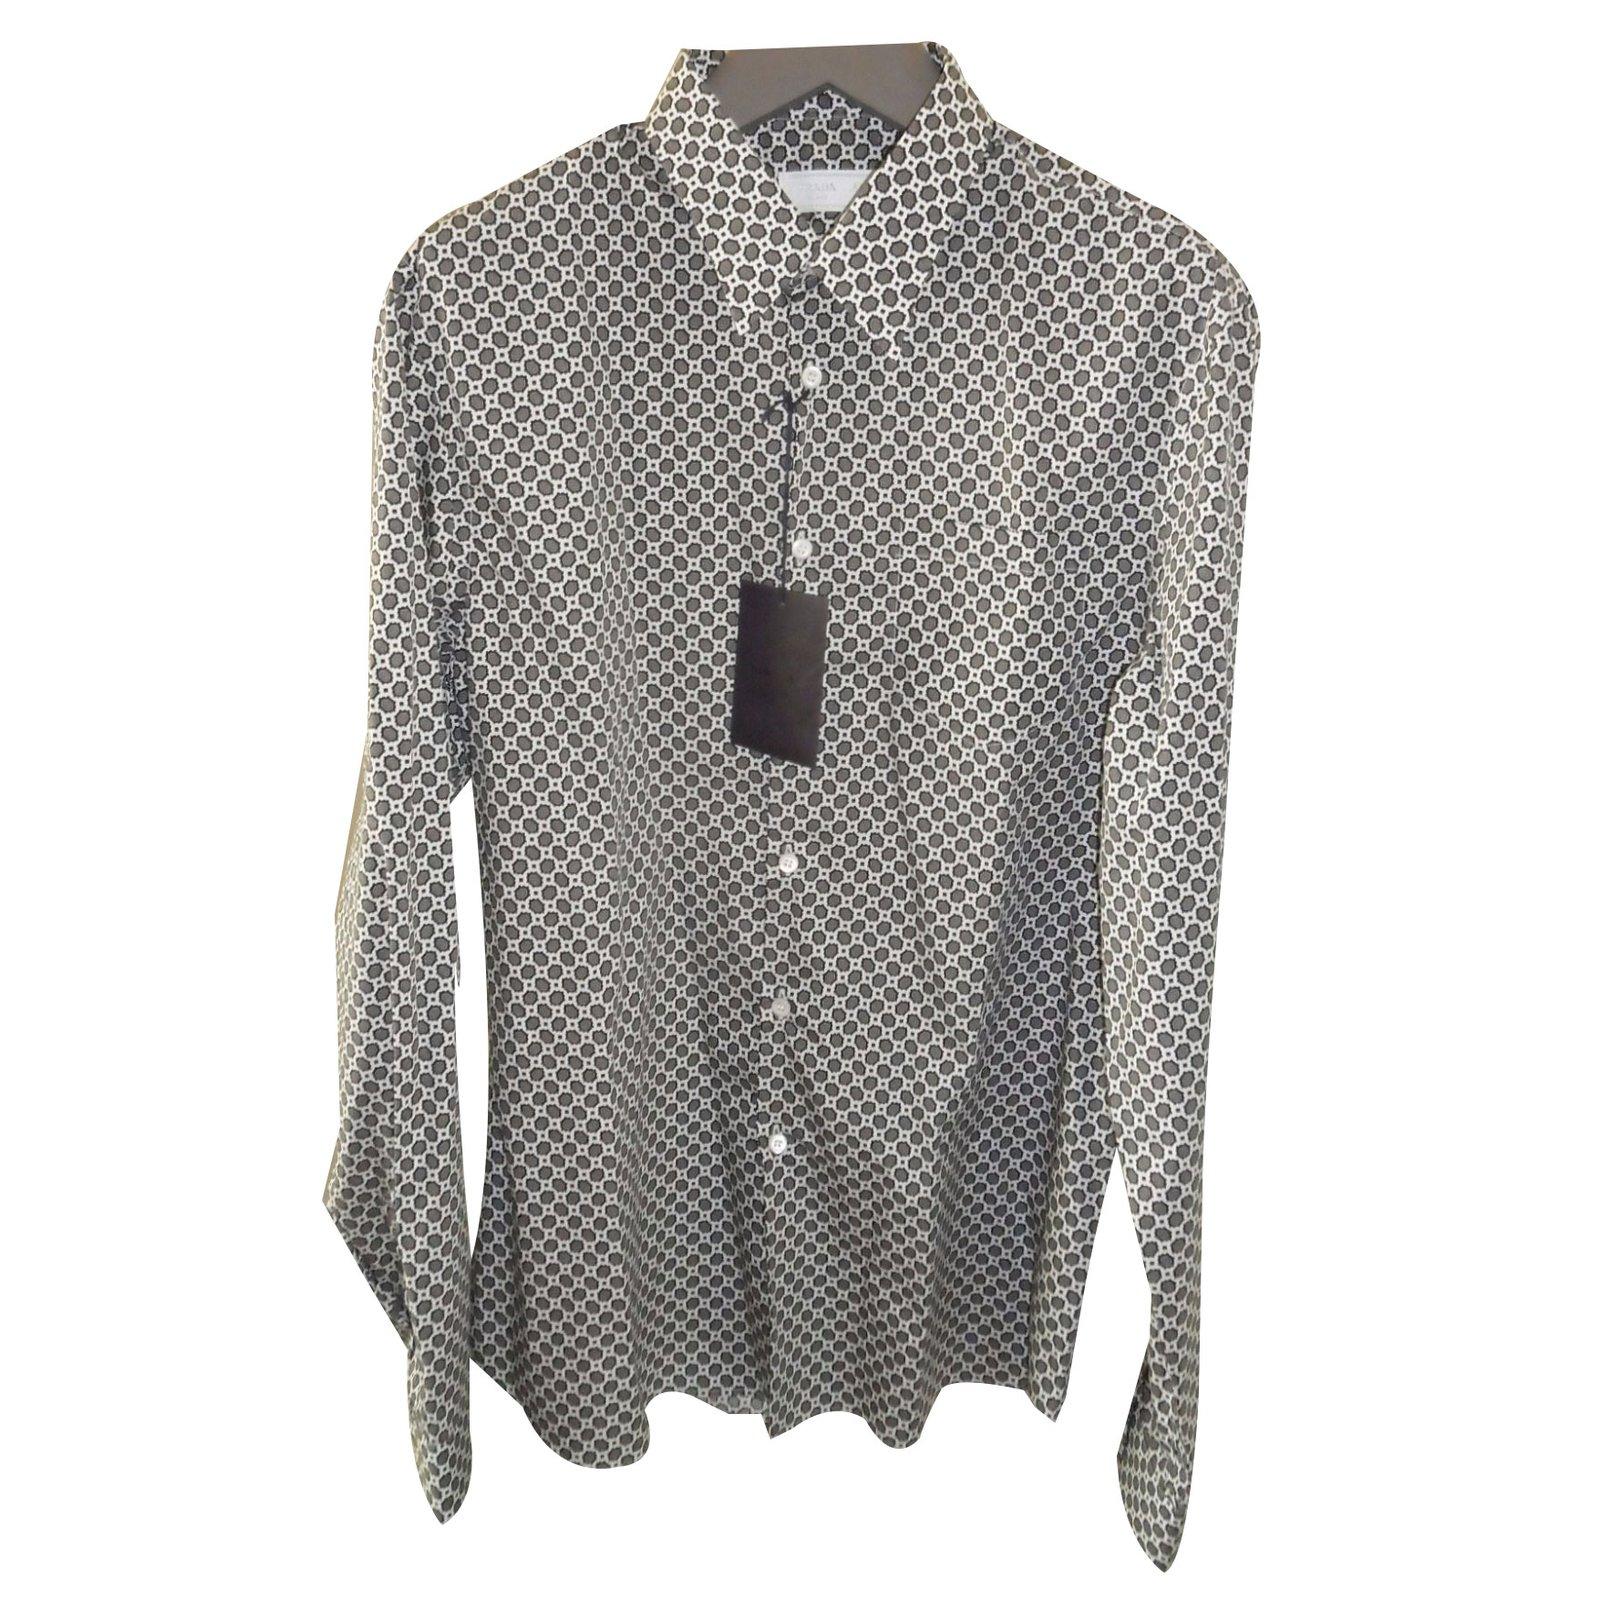 Prada Mens Dress Shirt Shirts Cotton Multiple Colors Ref23171